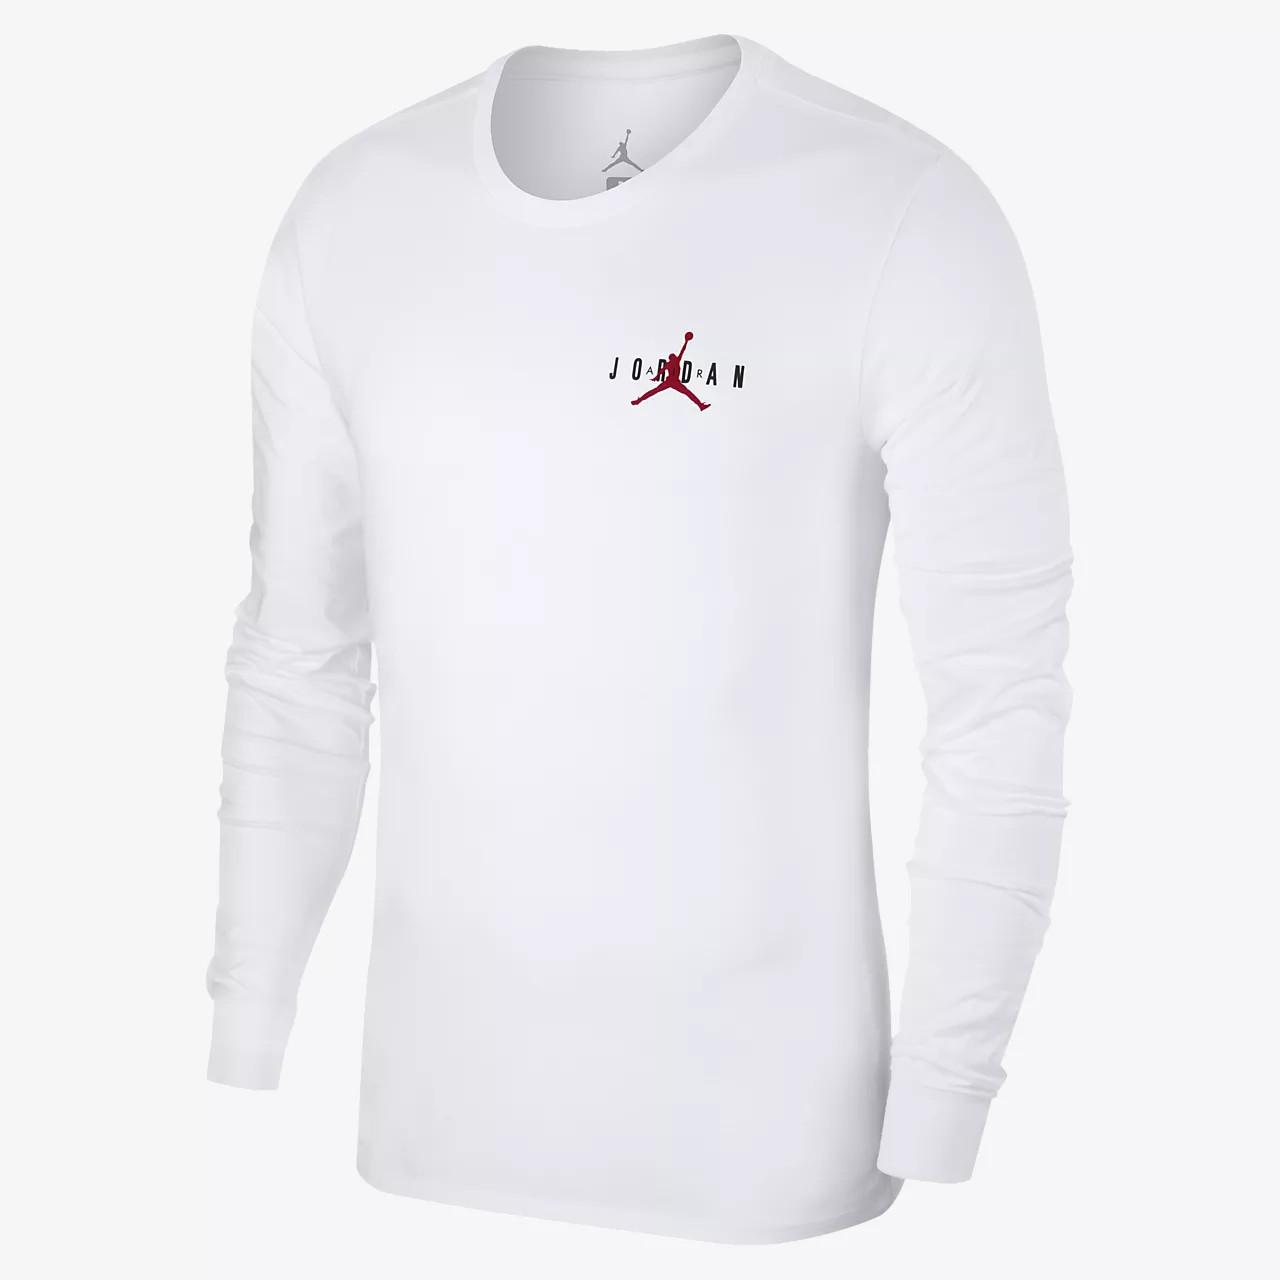 e07bb622 Толстовка Nike Jordan Sportswear Air Long-Sleeve T-Shirt AA7754-100  (Оригинал